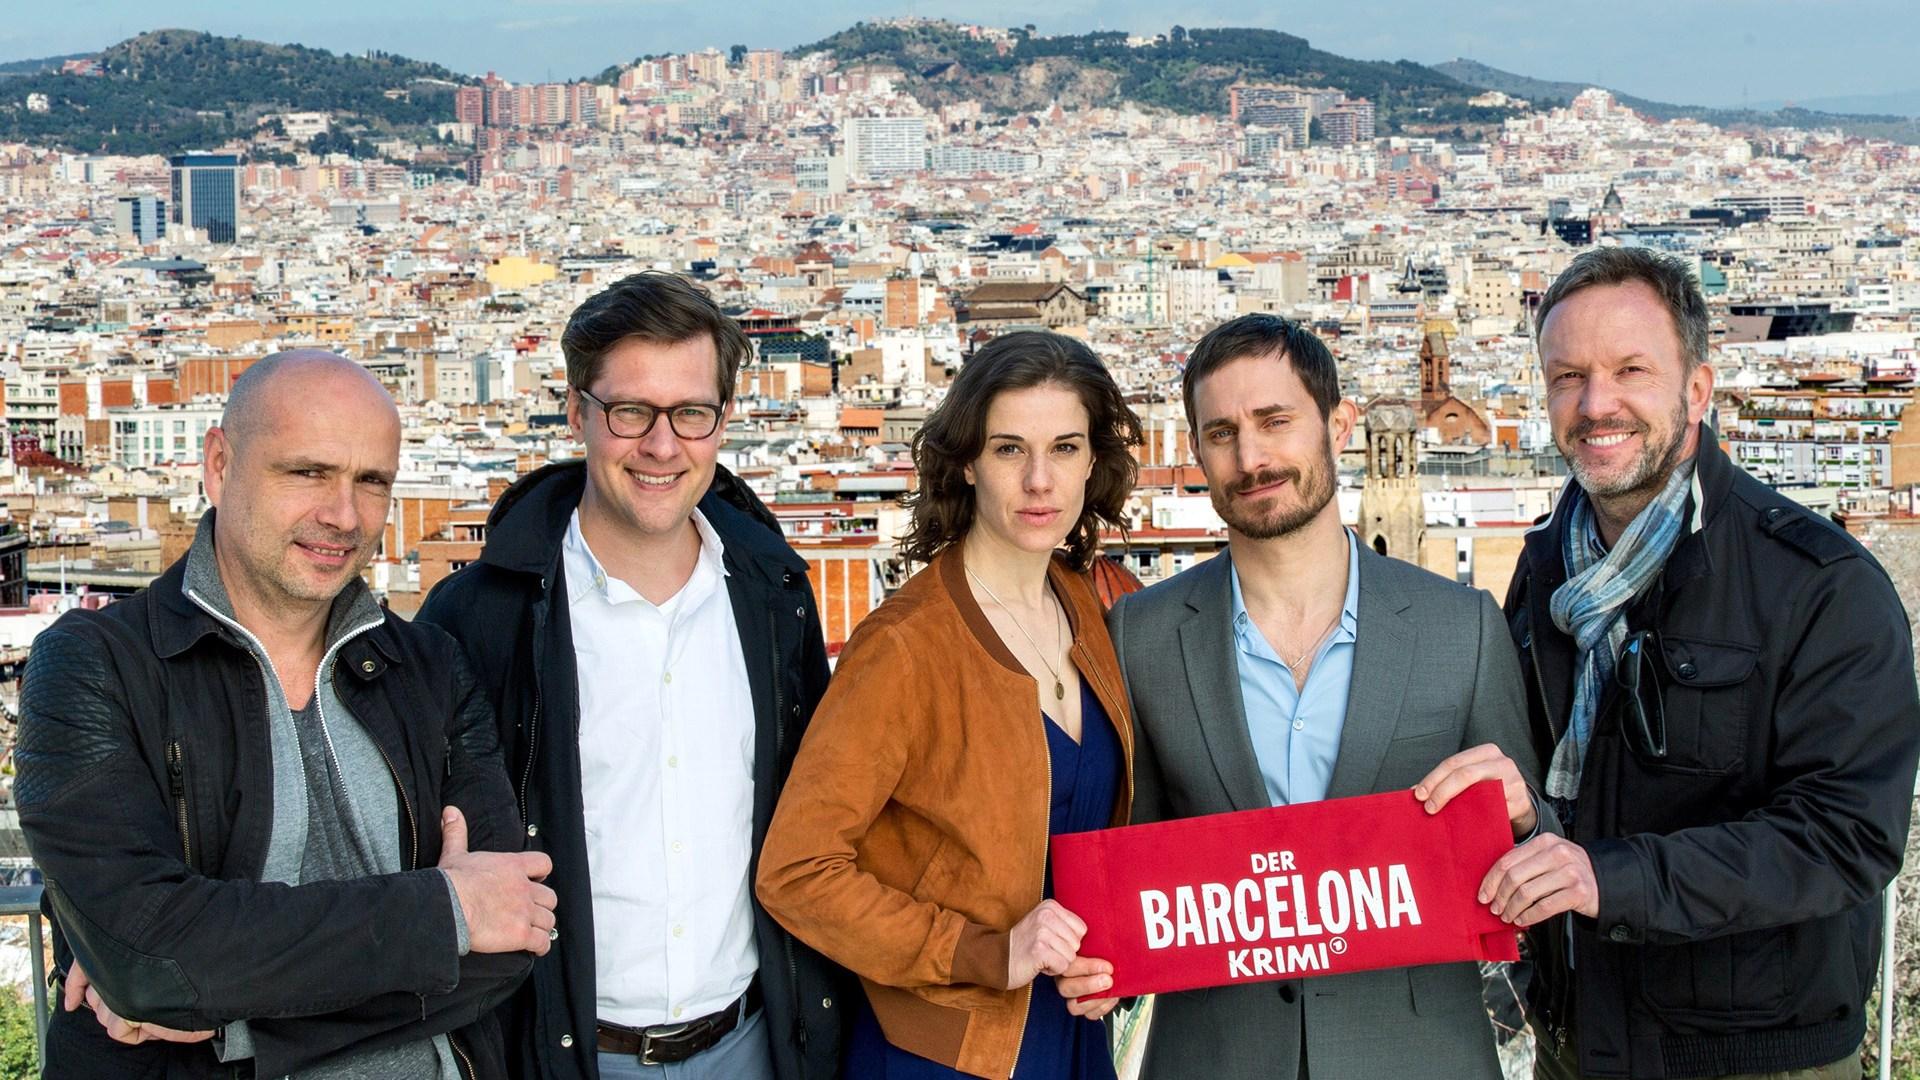 Der Barcelona-Krimi